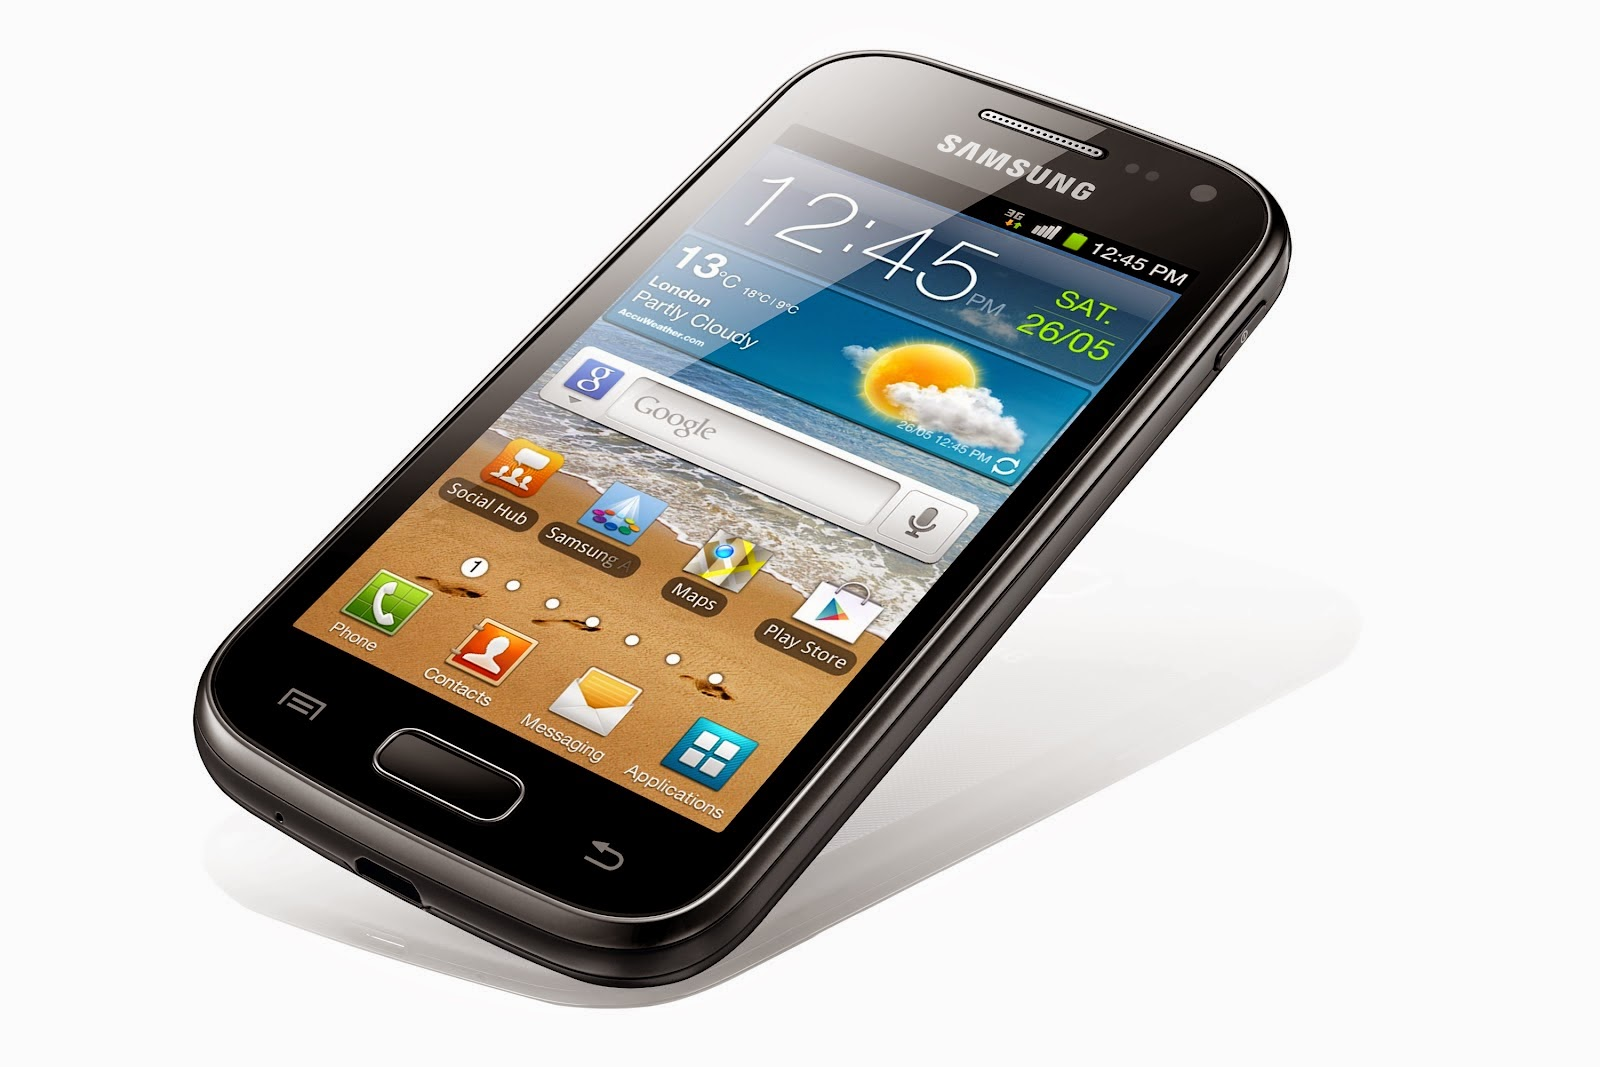 Hướng dẫn Hard Reset Samsung Galaxy Ace 2 i8160